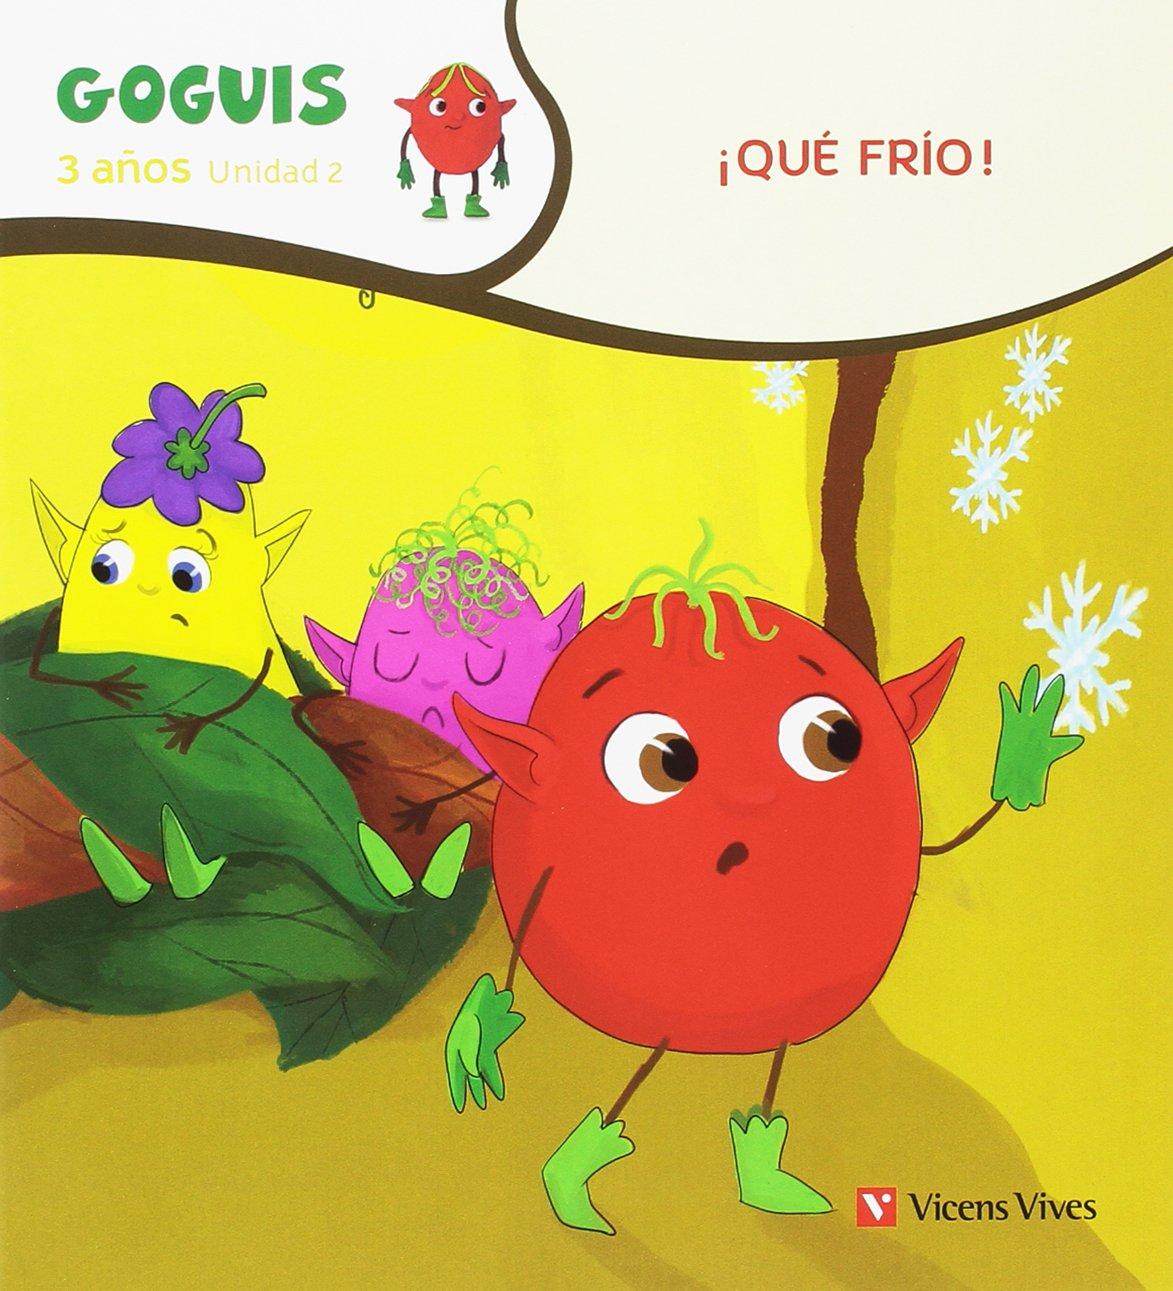 GOGUIS 3 AÑOS 1TRI: Aurora / Rodriguez Vallejera, Noemi / Aguilar Garcia, Isabel Estebanez Estebanez: 9788468251127: Amazon.com: Books